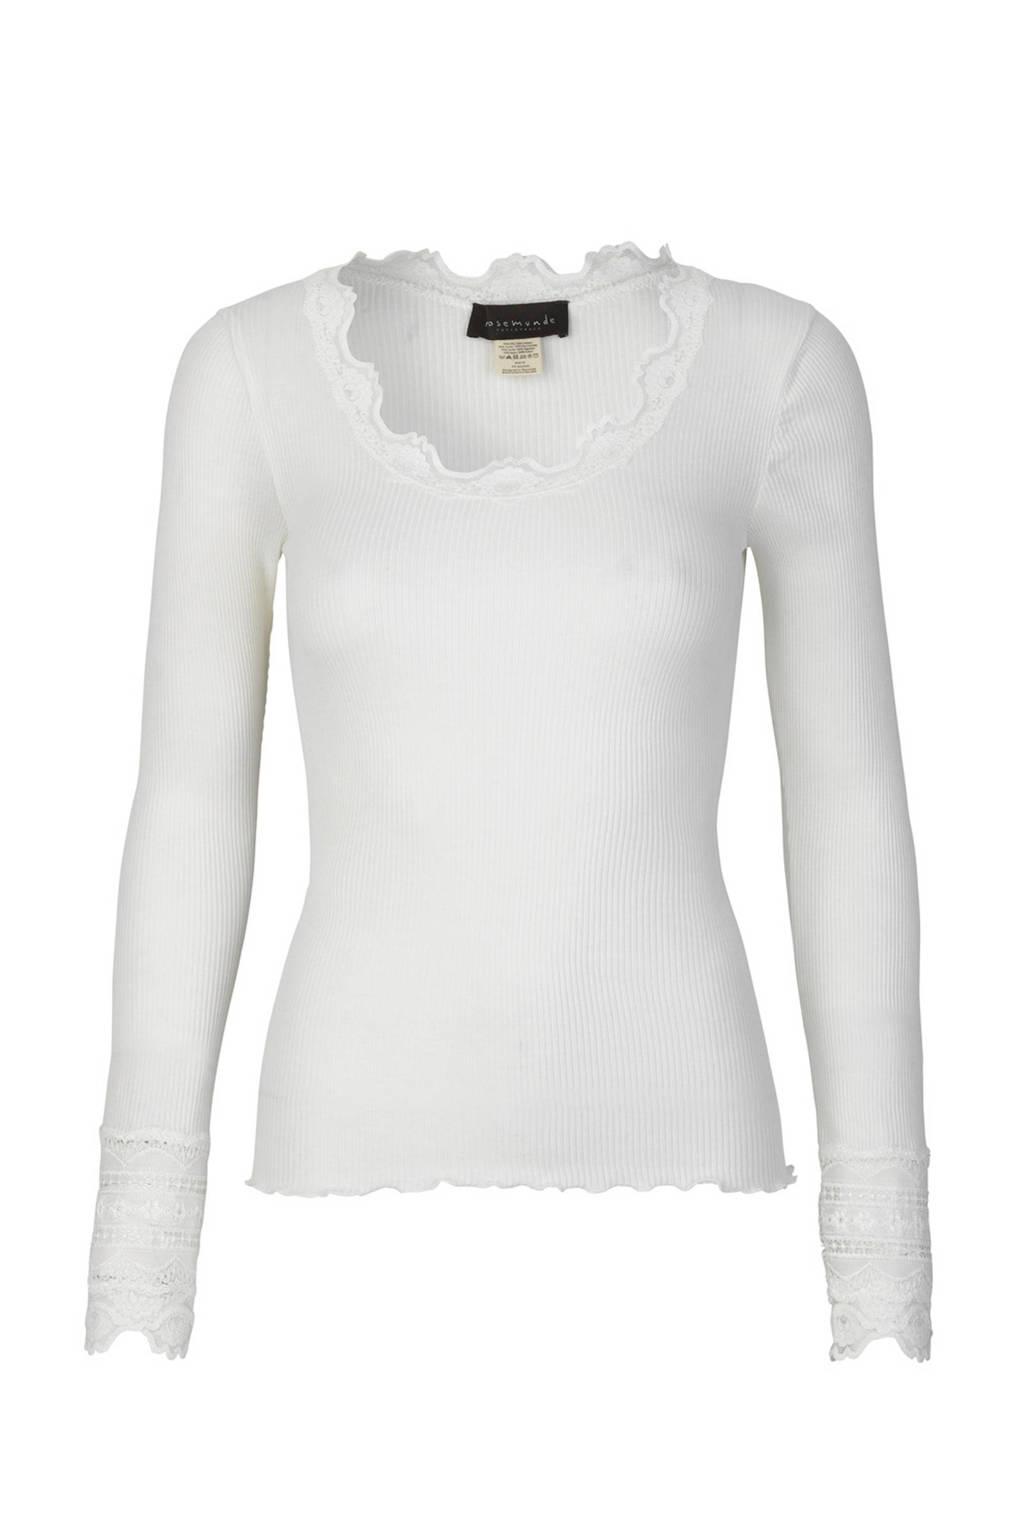 Rosemunde ribgebreide basic longsleeve met zijde wit, Wit